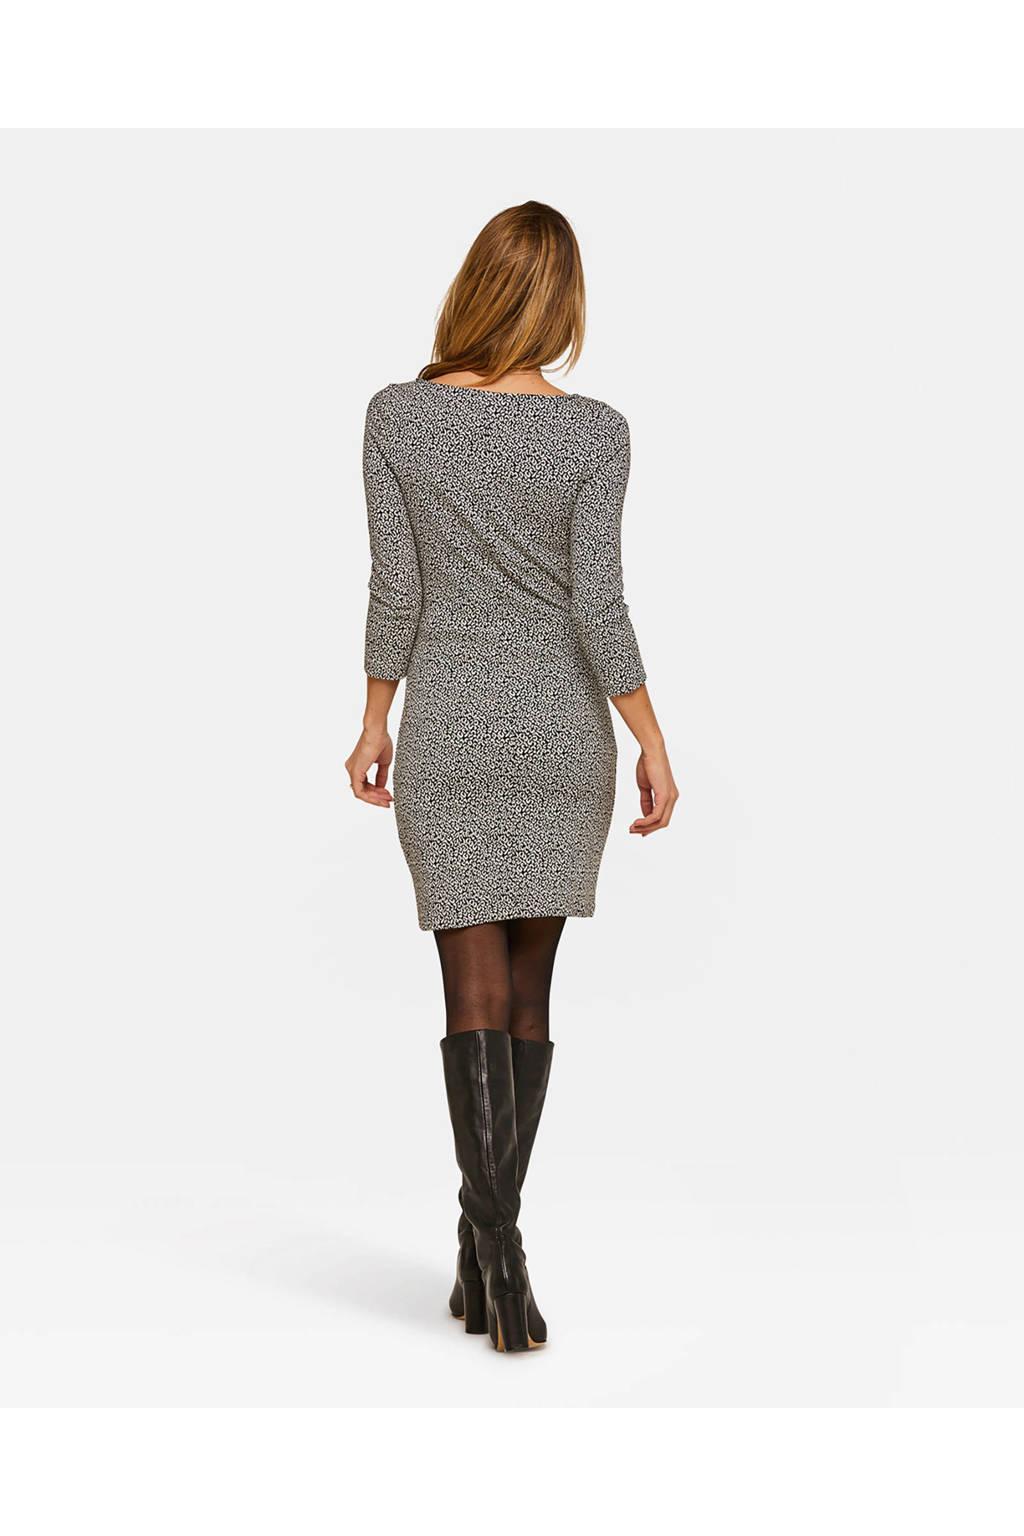 We Jurk Fashion Gewoven Met Zwart Panterprint Fijn UqOfaAU